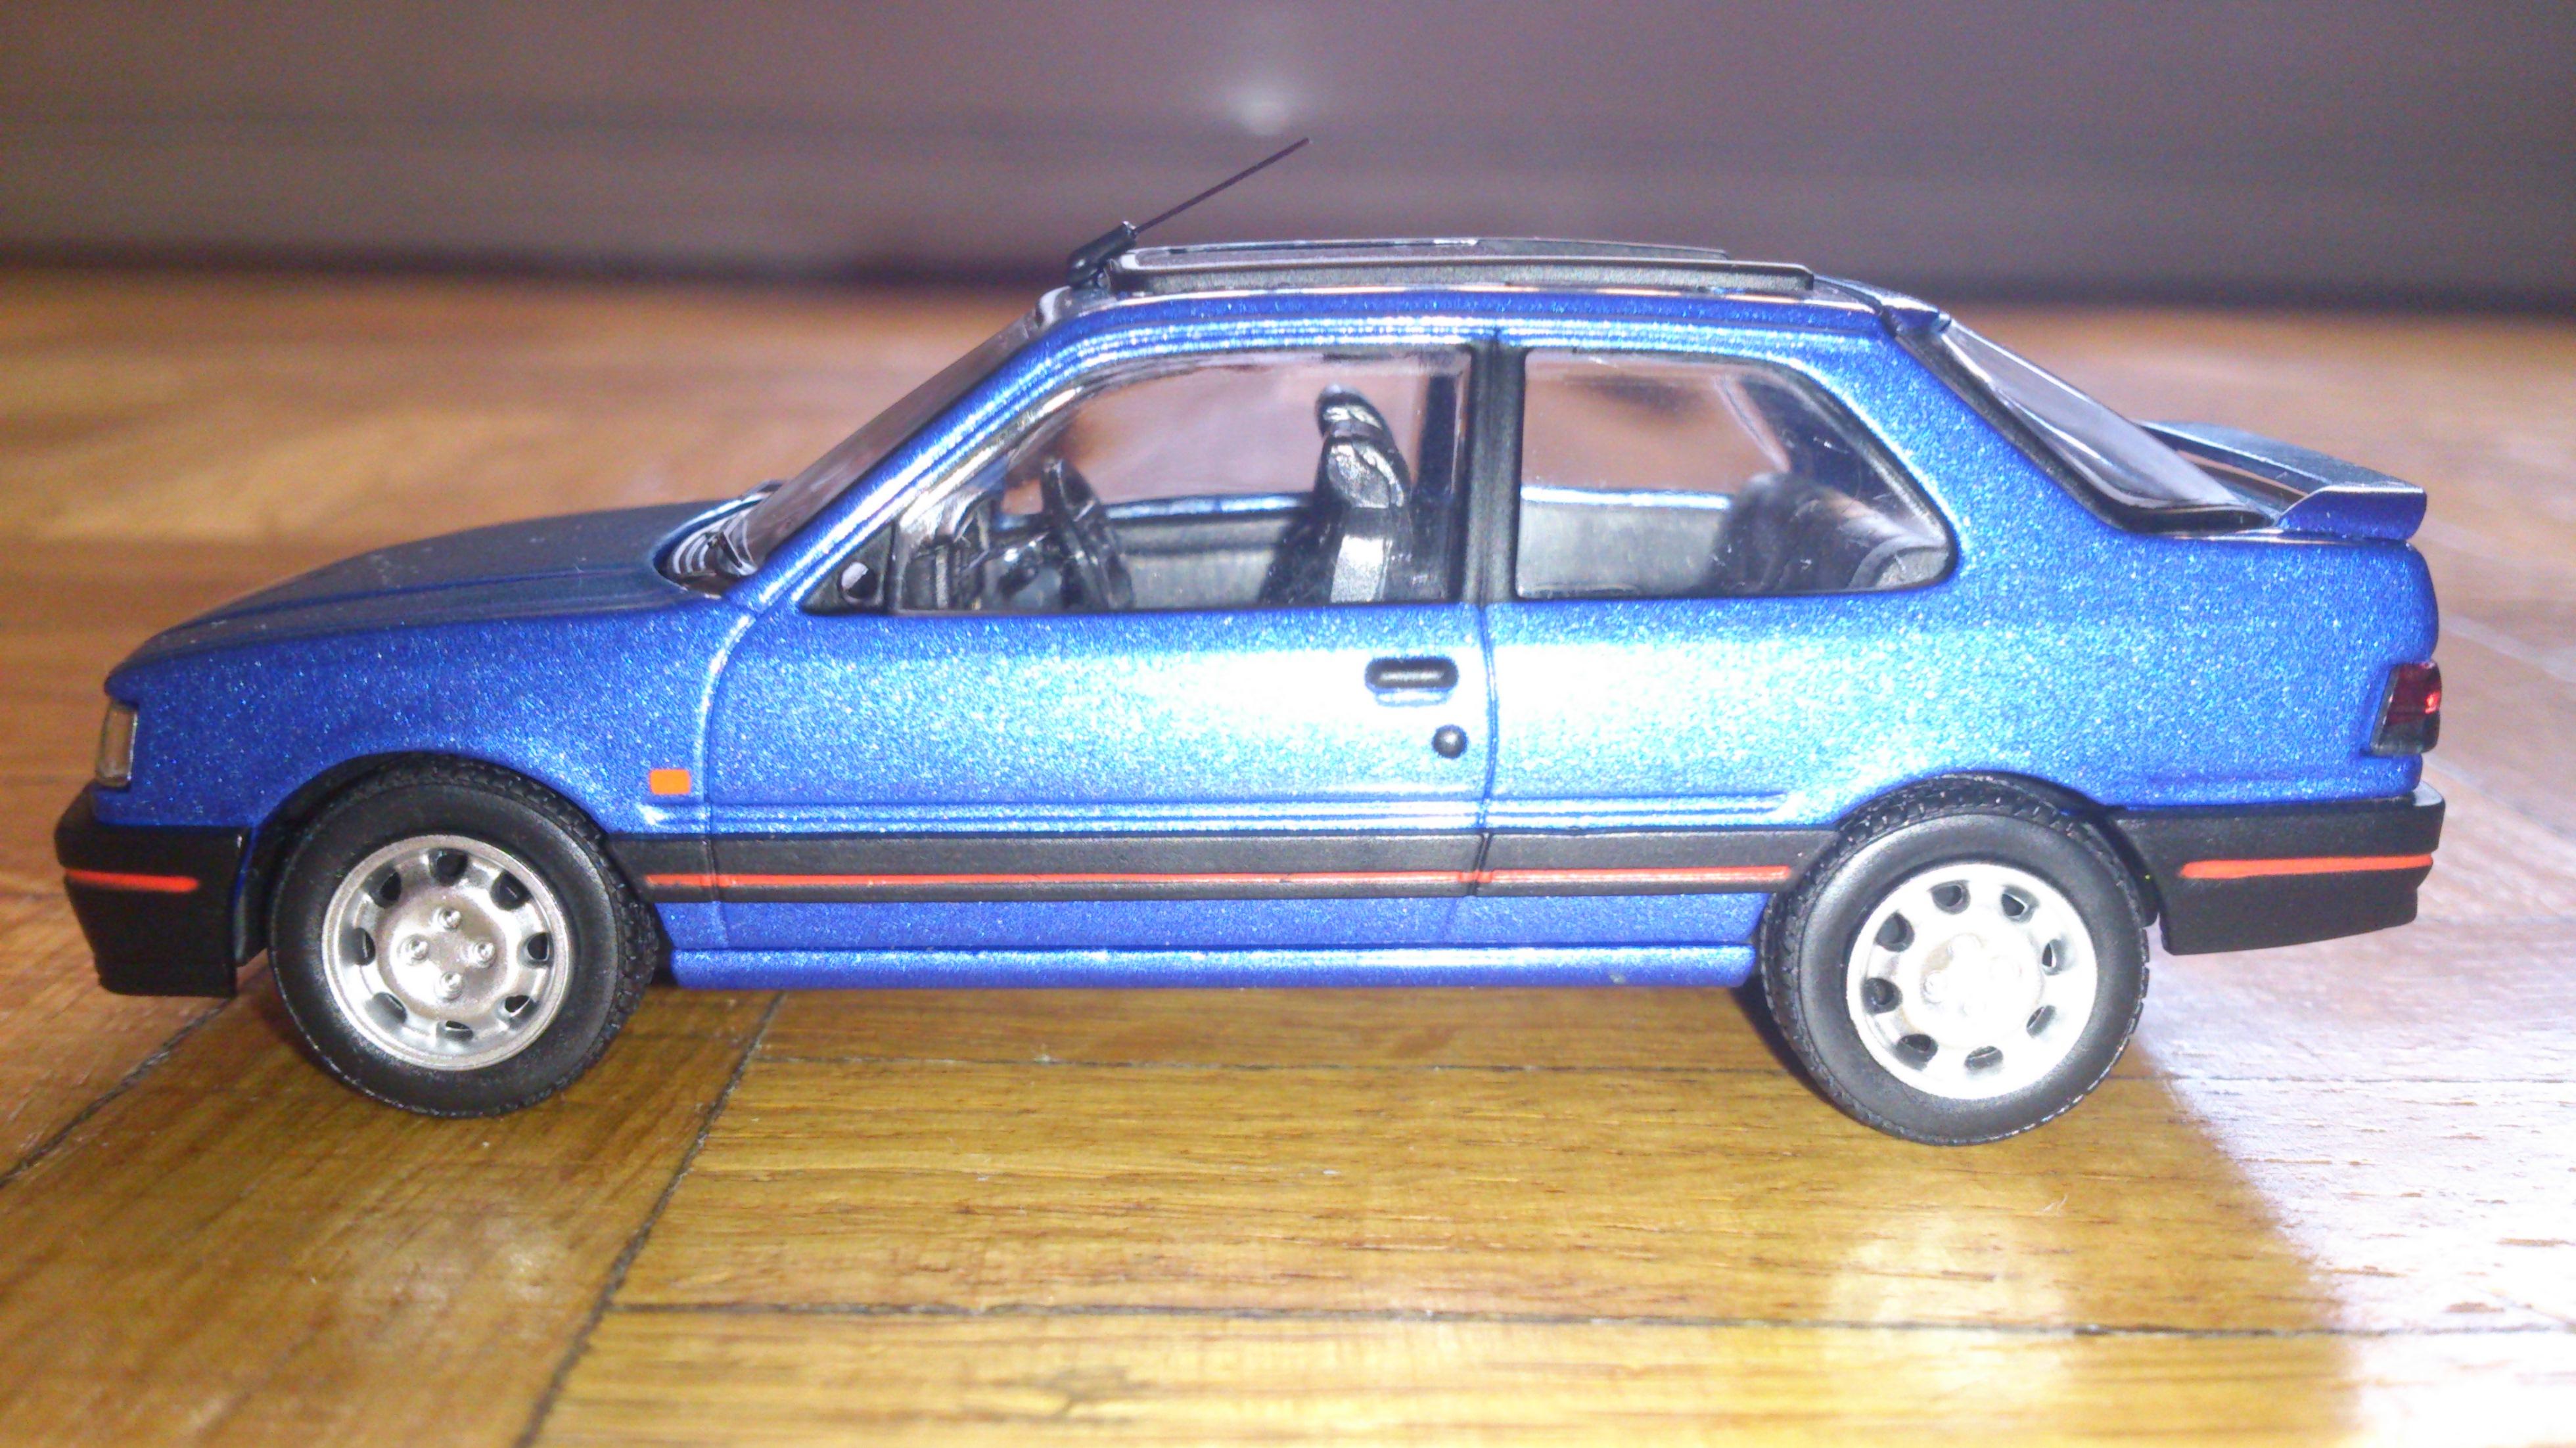 Peugeot_390_gti_16s